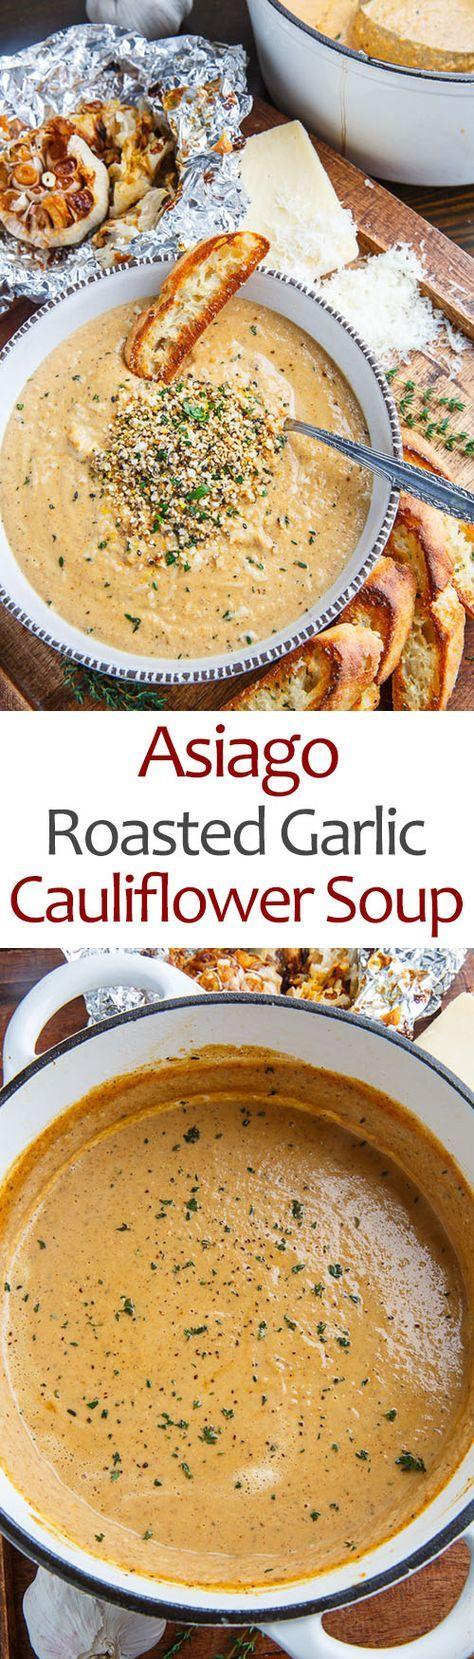 Asiago Roasted Garlic Cauliflower Soup